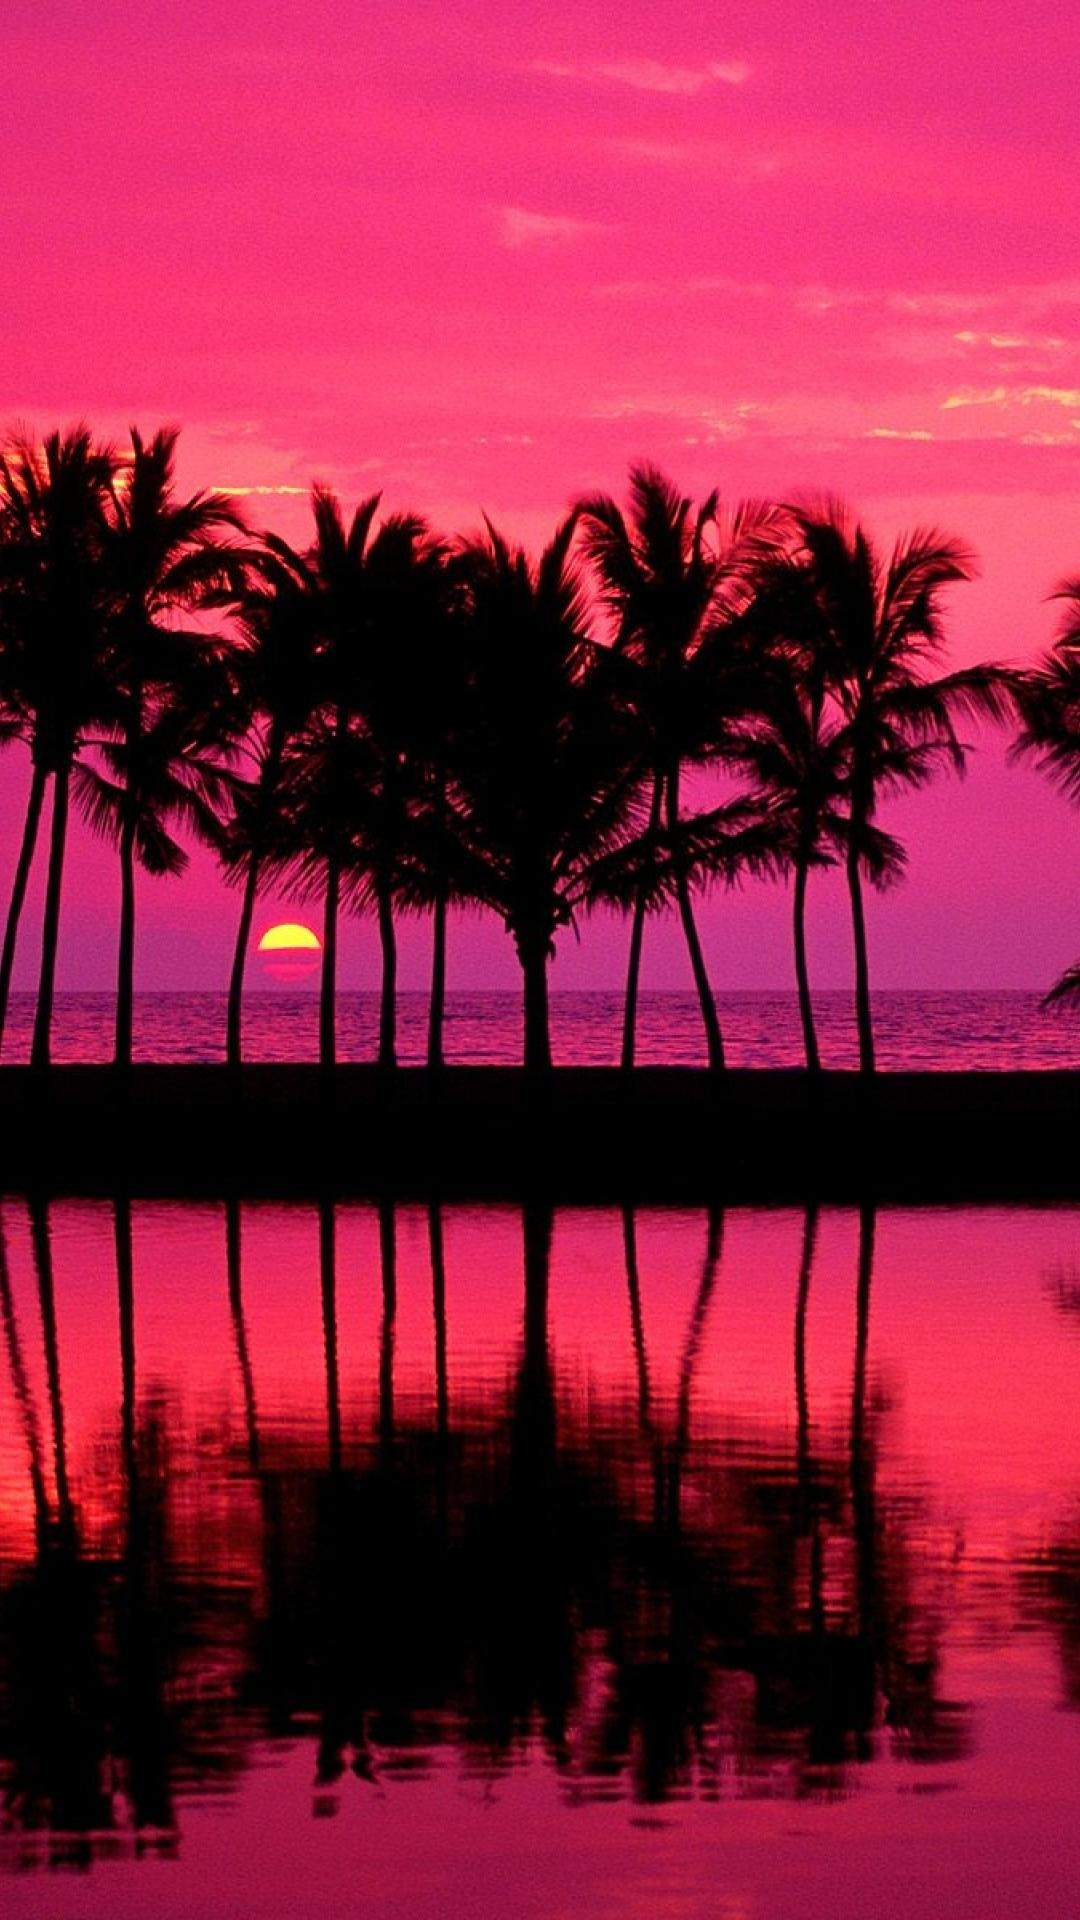 … Pink Iphone Background Tumblr Tumblr Palm Trees Girly Pink Iphone Plus  Wallpaper Tumblr Iphone …